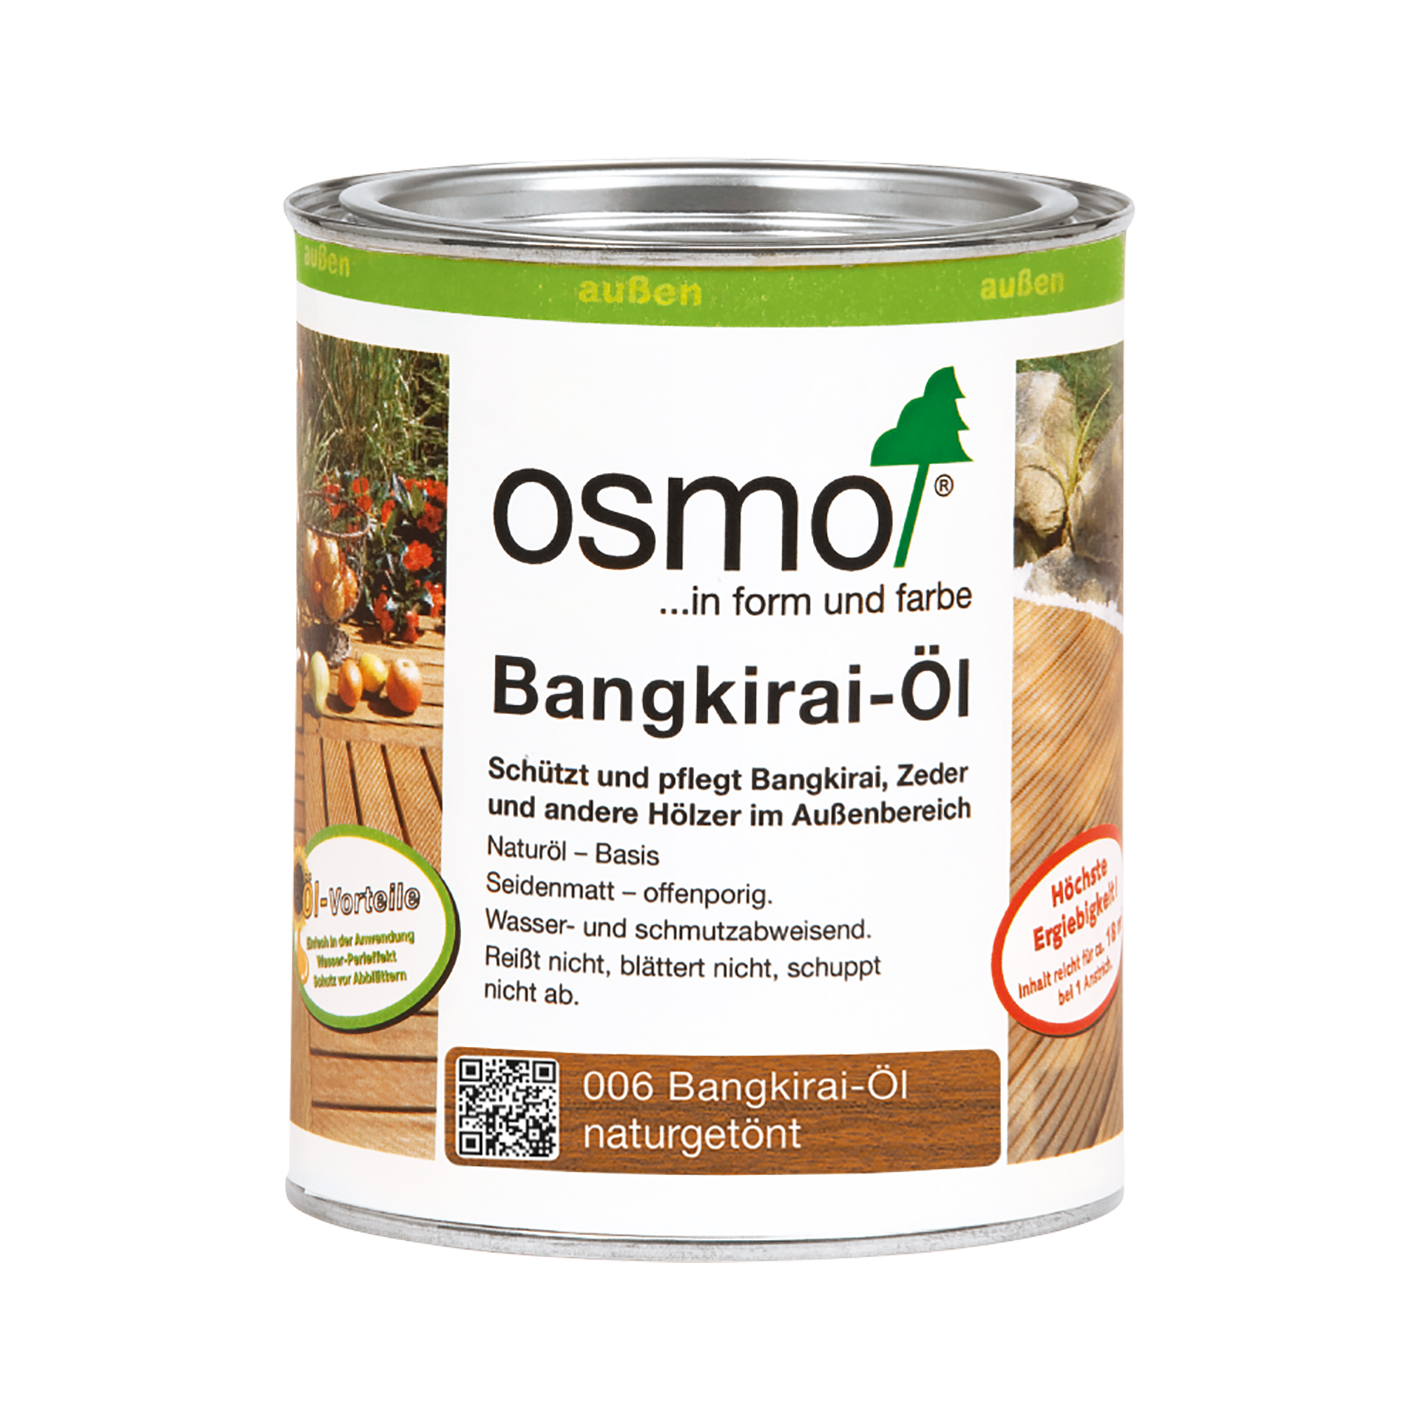 Osmo Bangkirai-oil nature 2,5 Ltr.